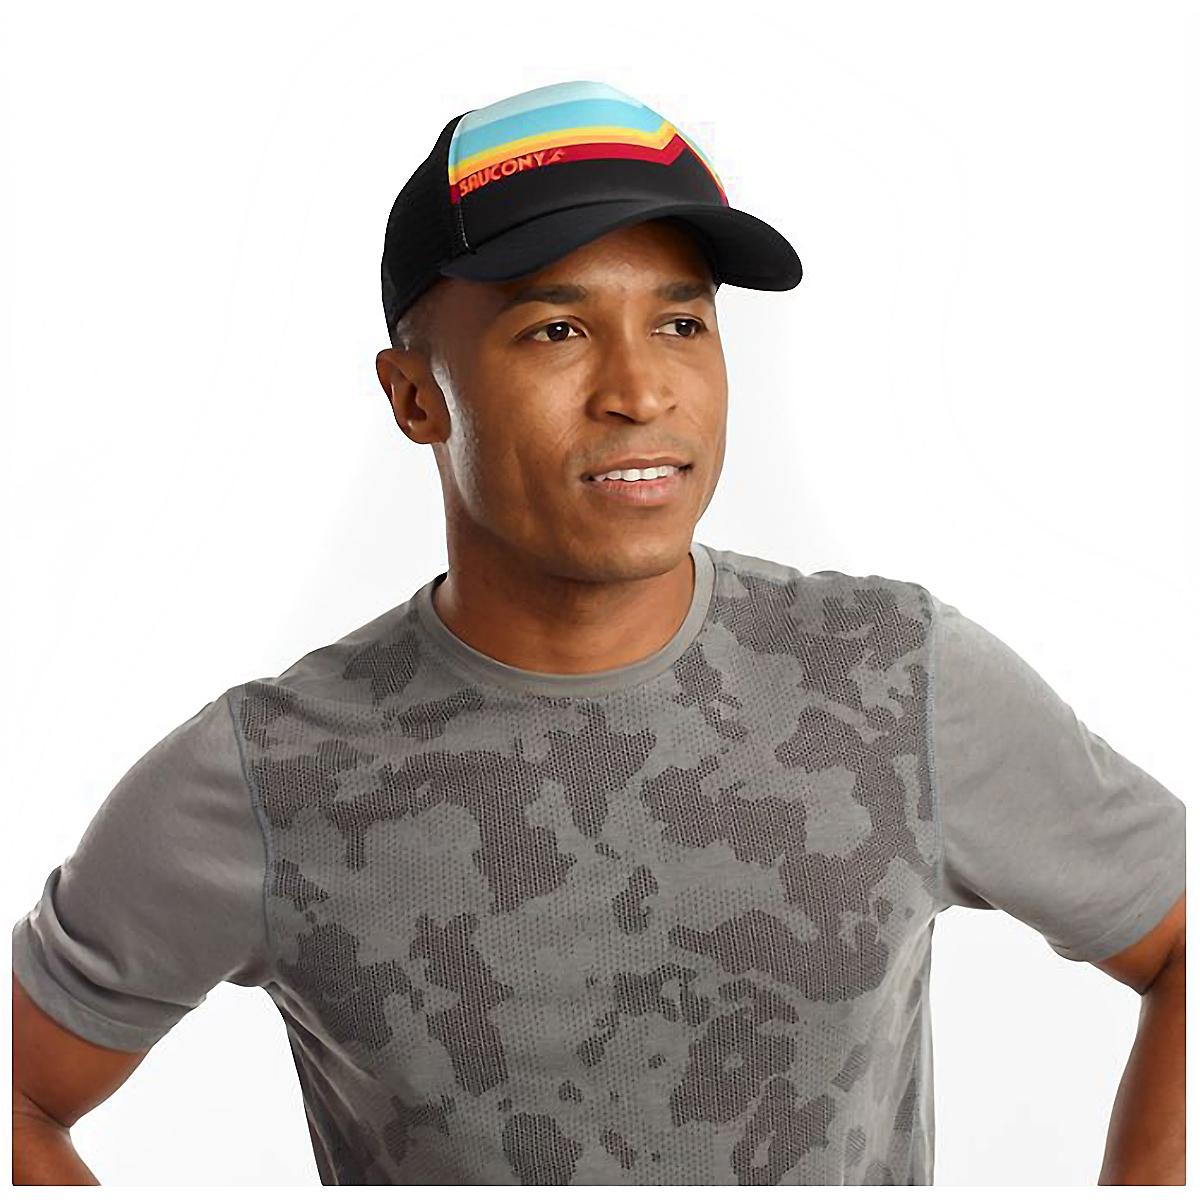 Saucony Foam Trucker Hat - Color: Black, Black, large, image 3